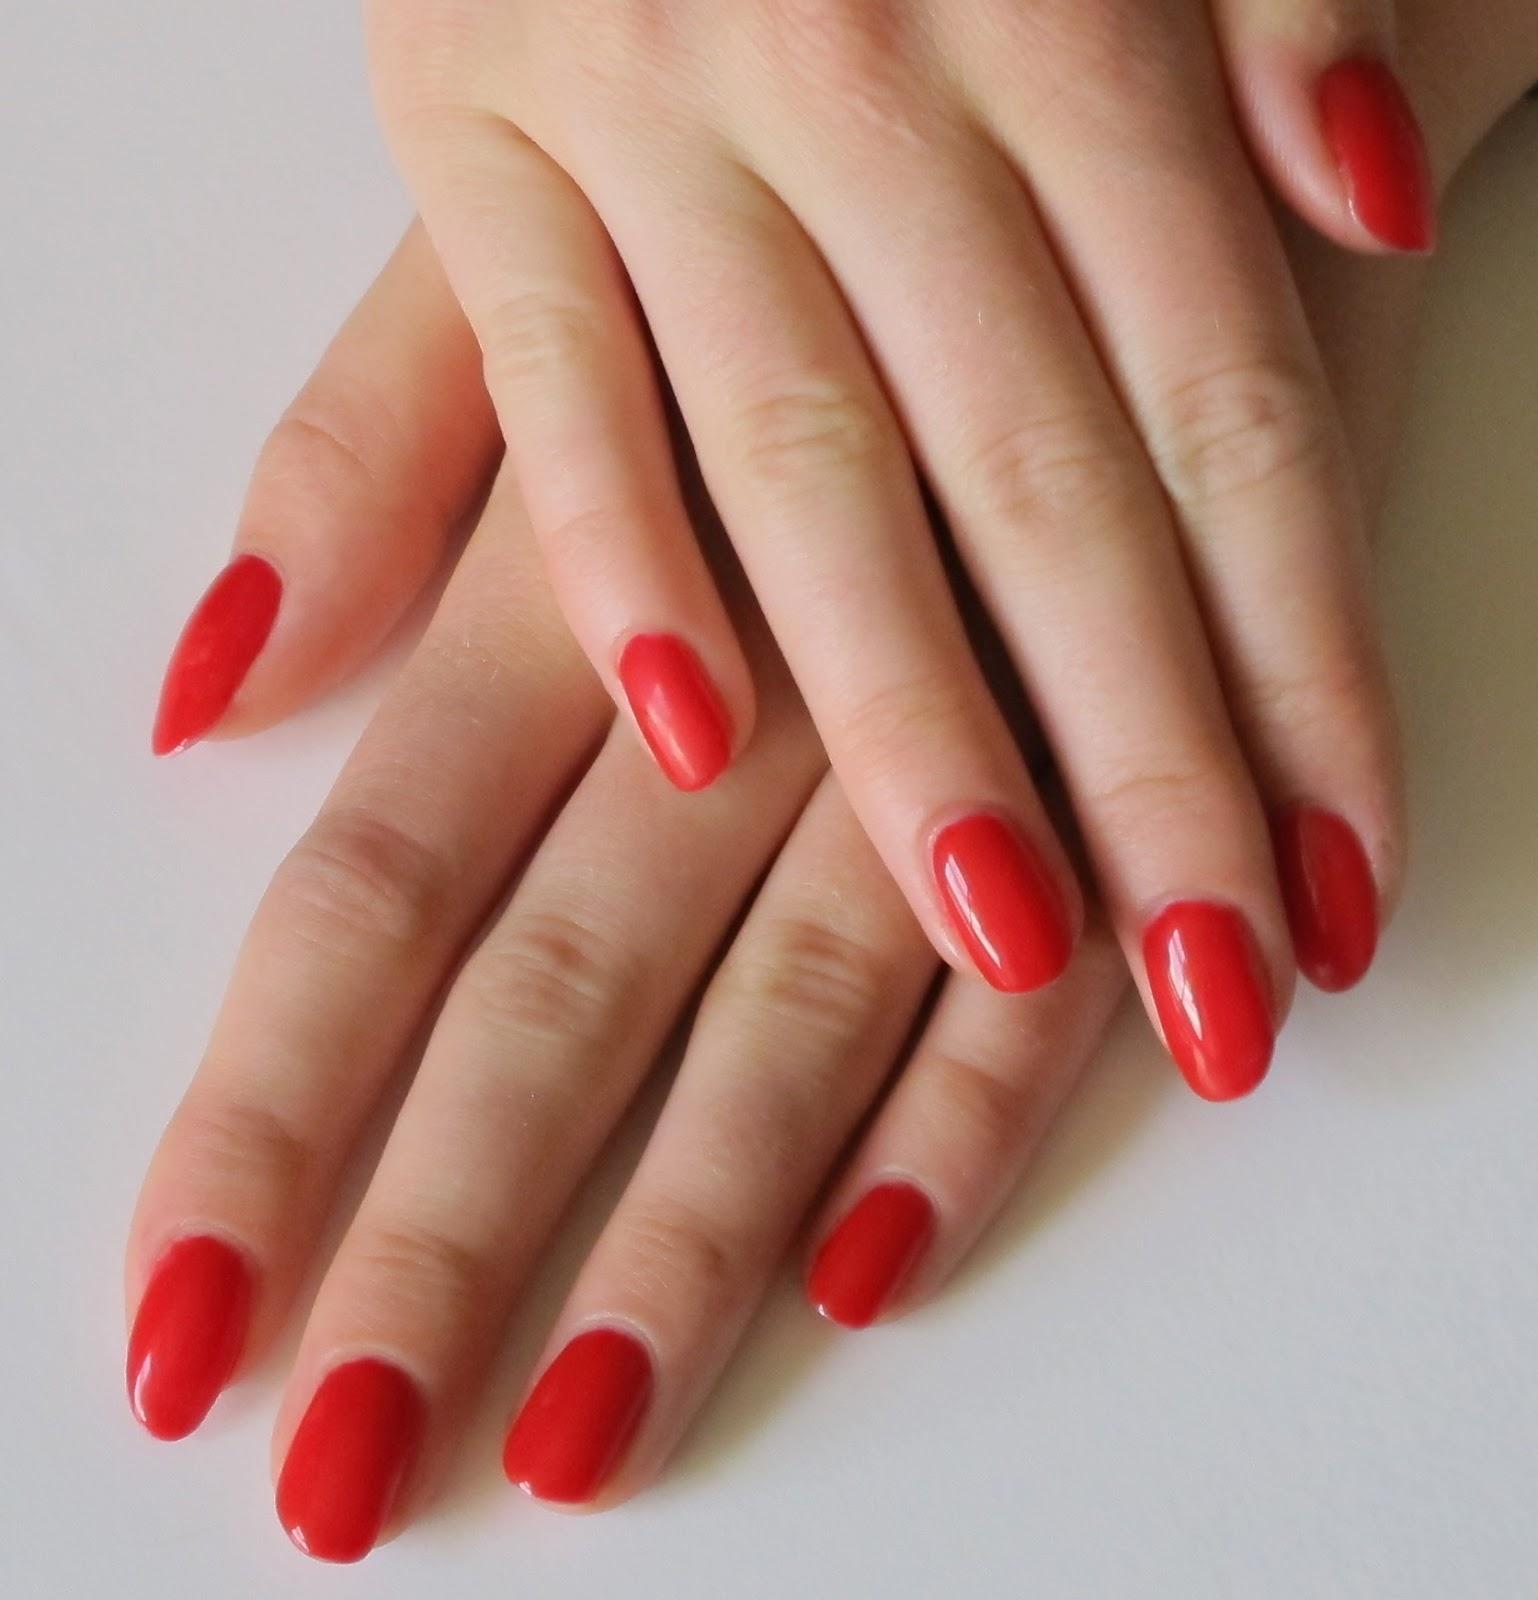 Gel Series, Part 2: Practising Gel Manicures | One Nail To Rule Them ...